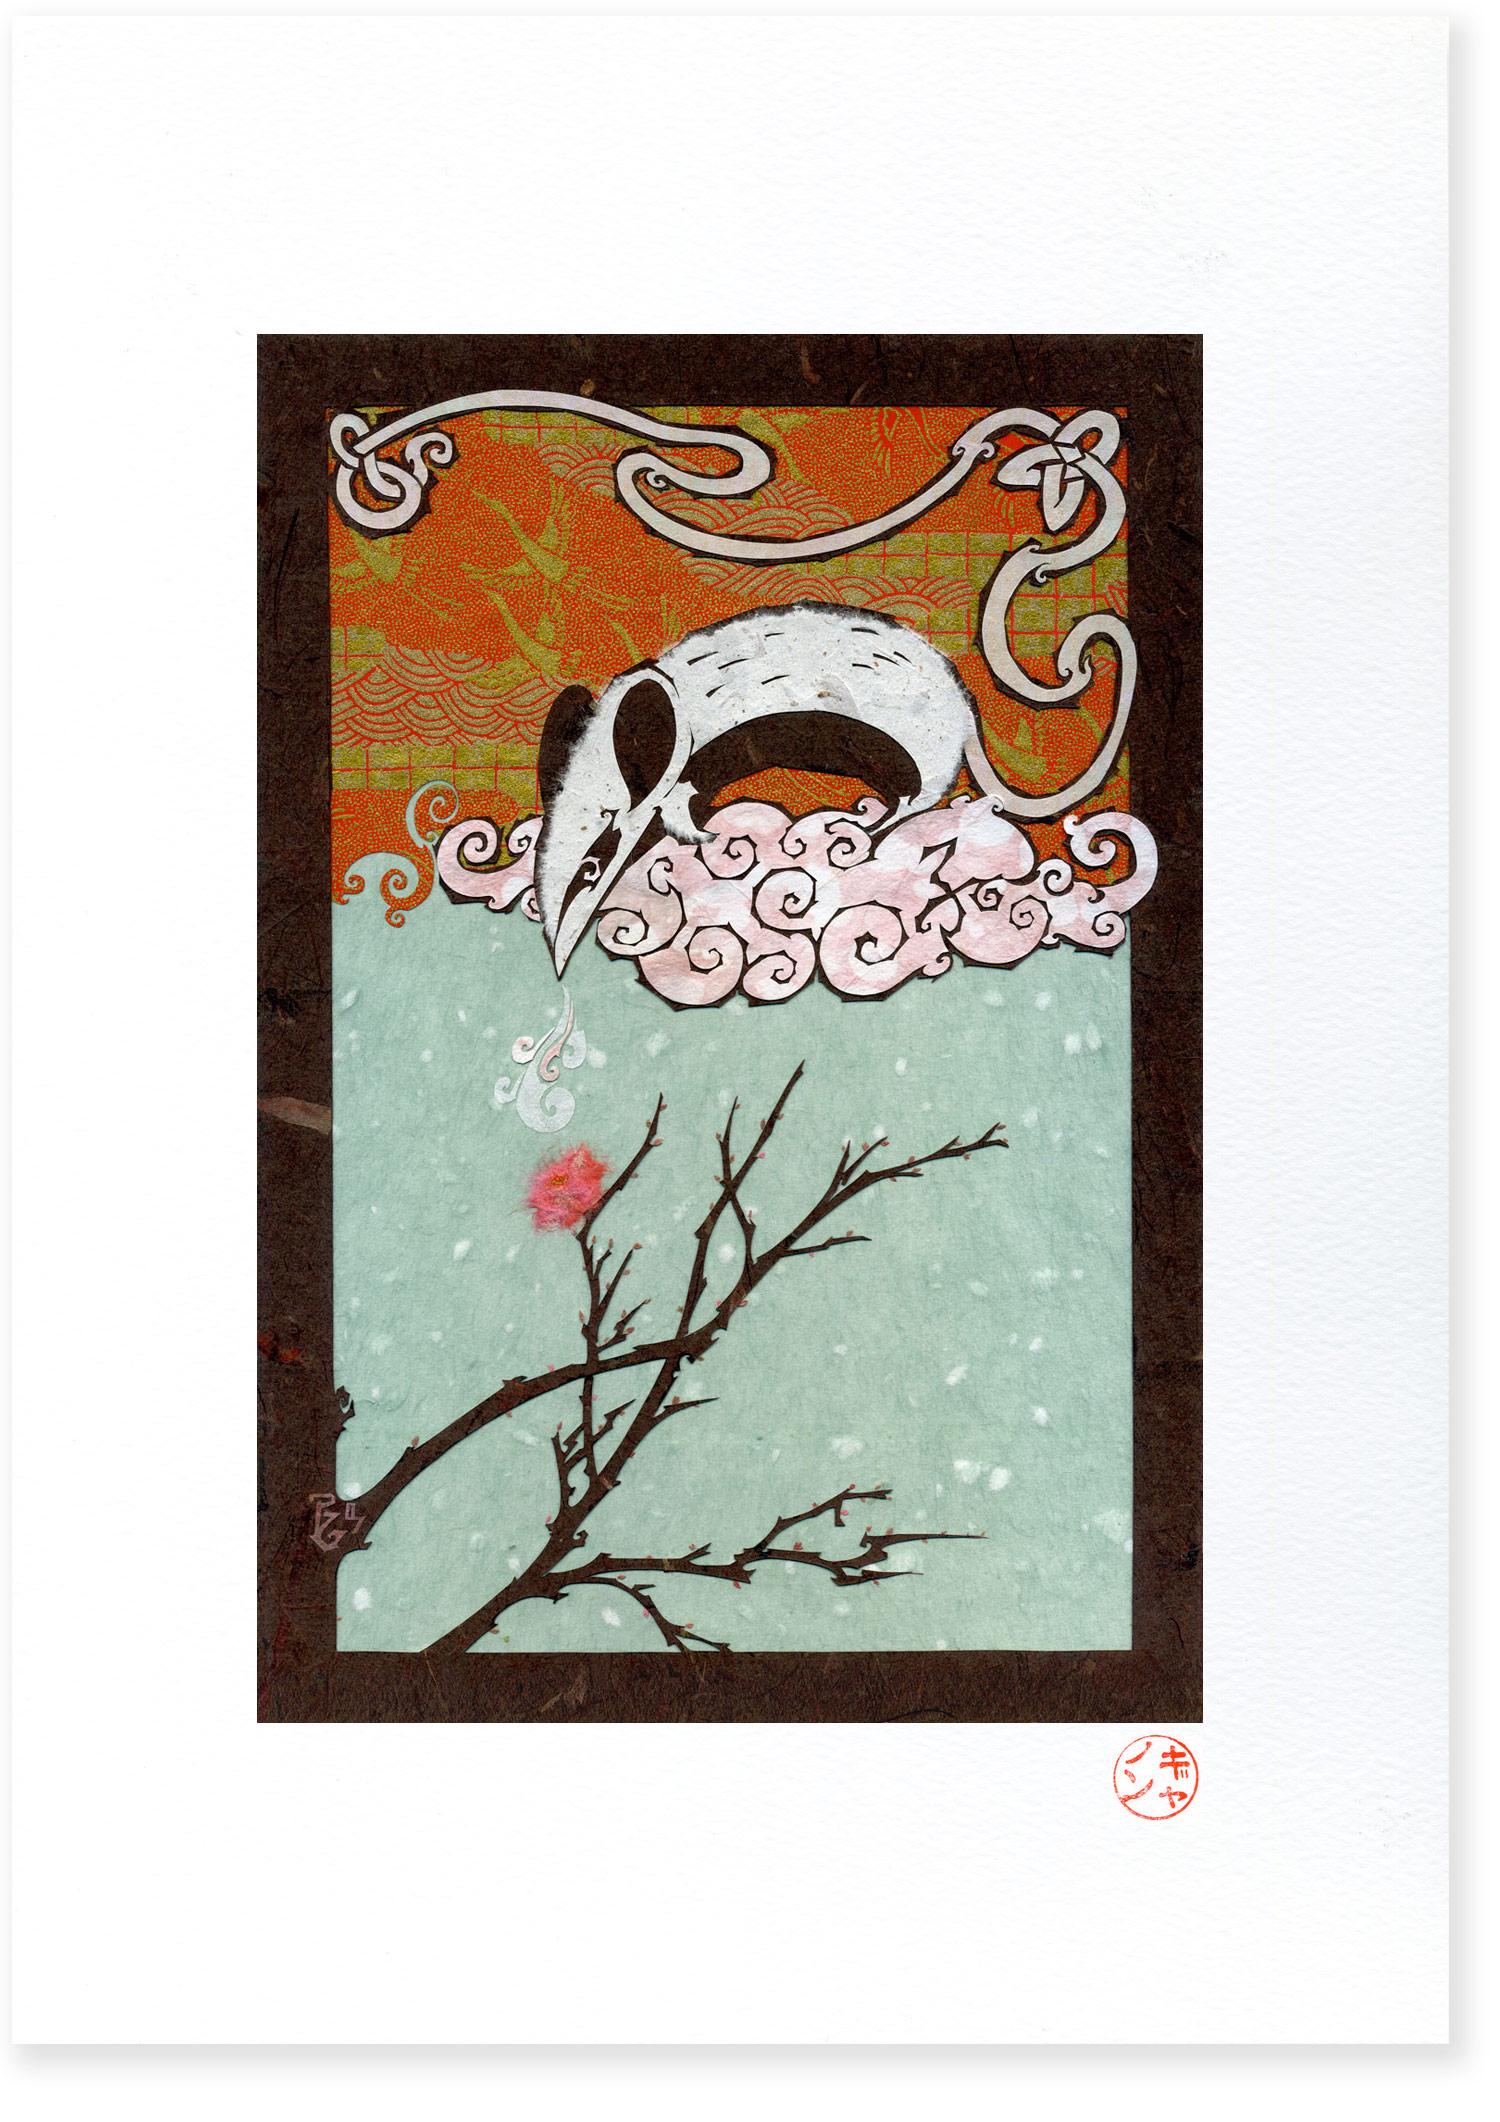 The Plum Blossom and the Fertile Breath (ID No.8)